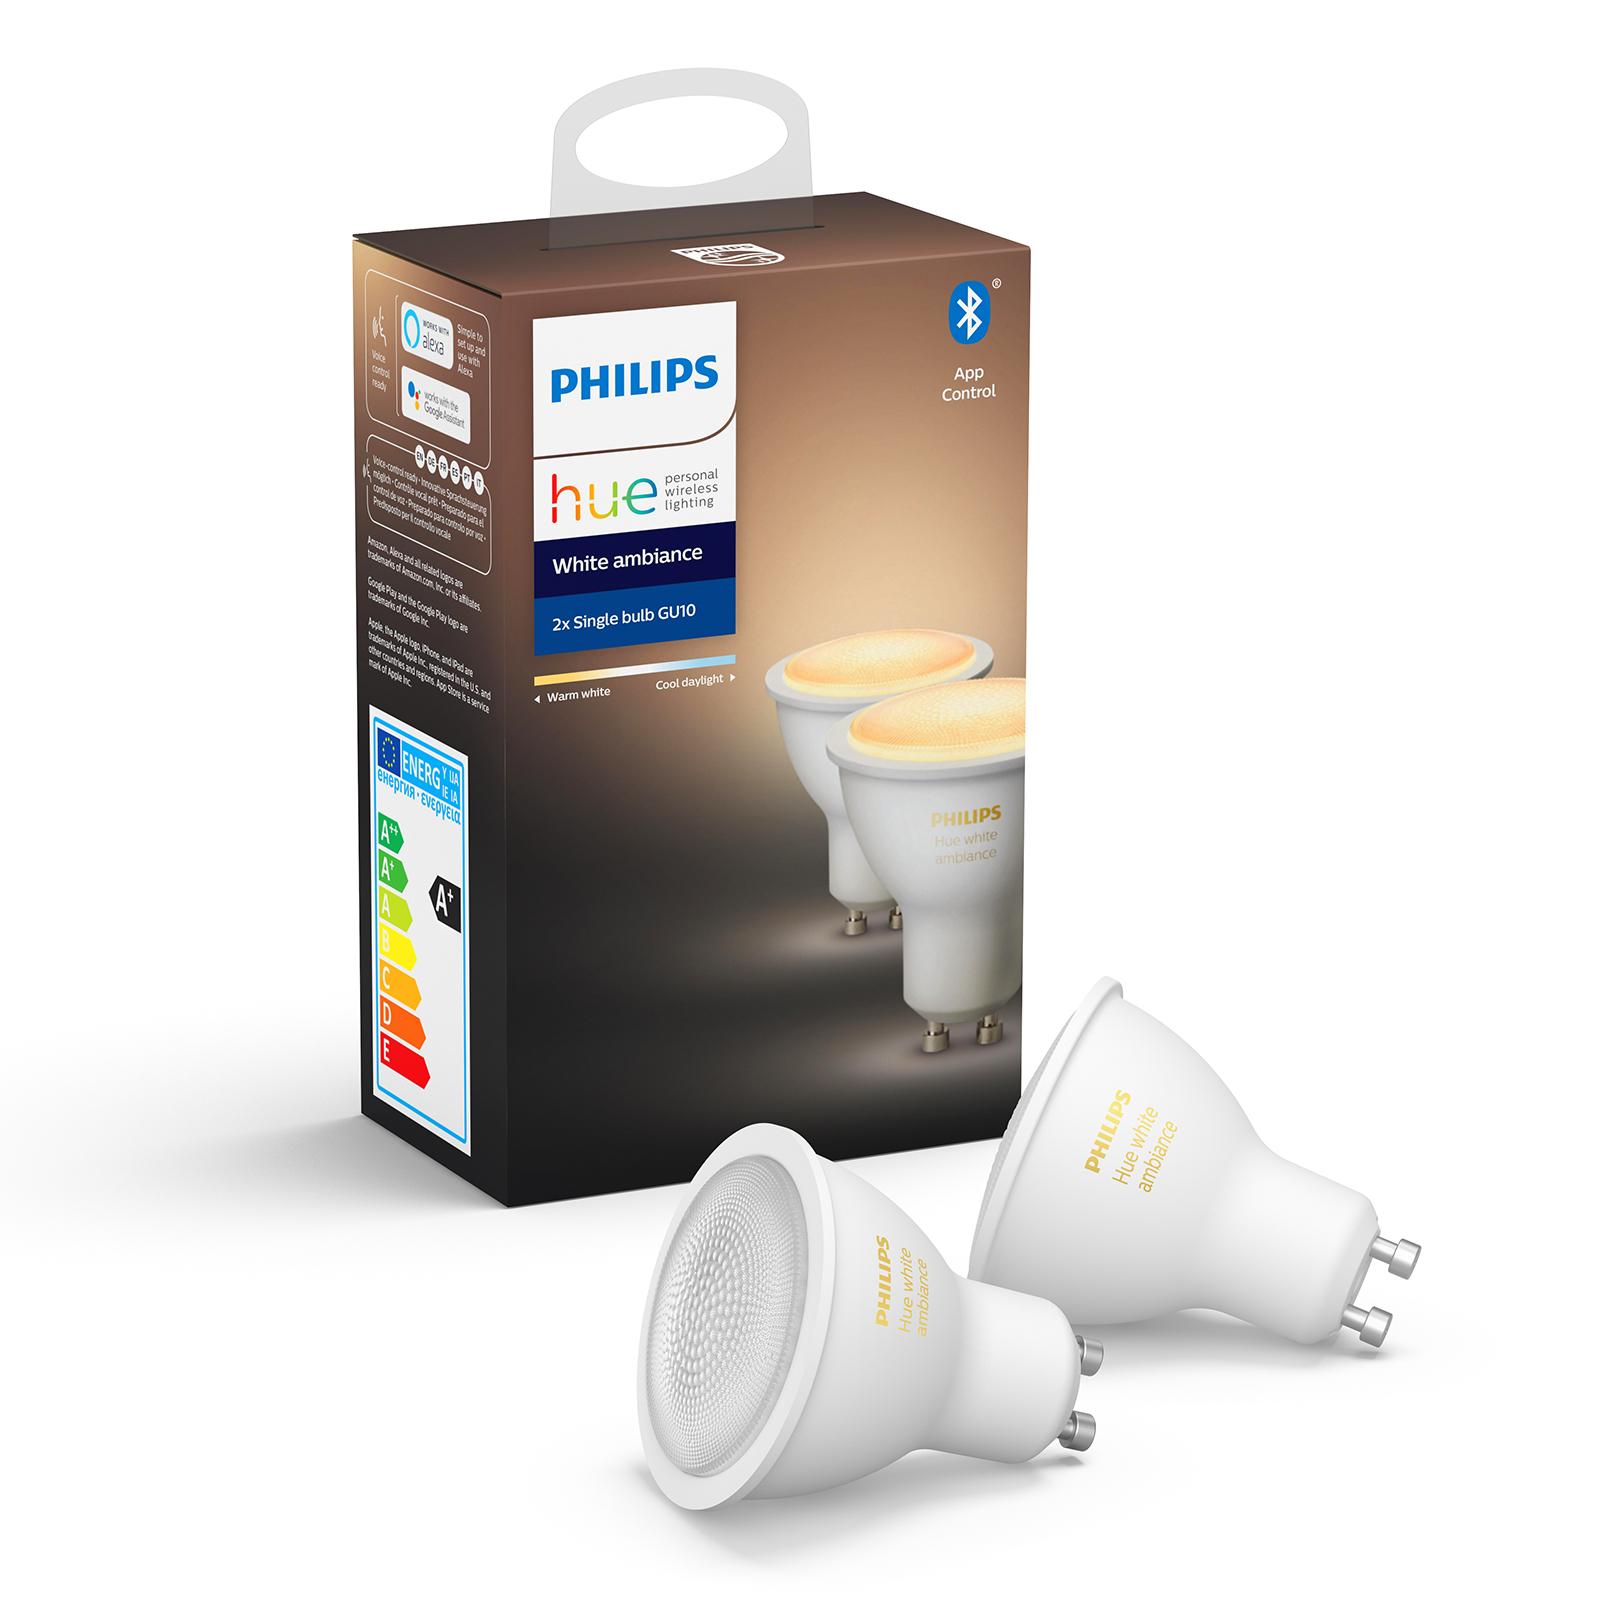 Philips Hue White Ambiance 5 W GU10 LED, set da 2